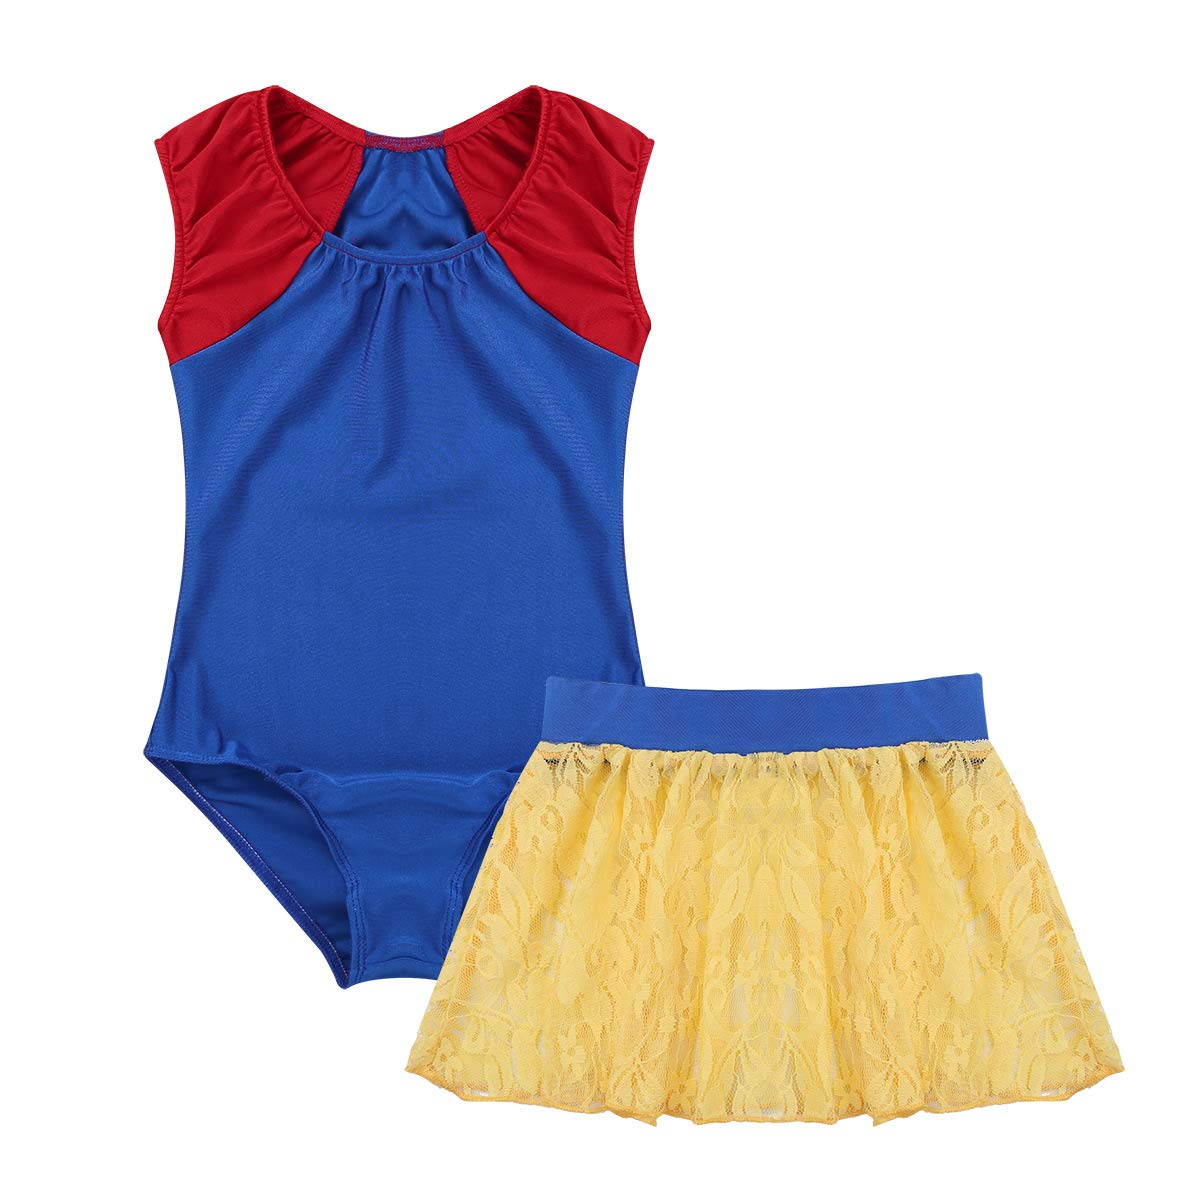 Freebily Child Girls Snow Princess Ballet Dance Gymnastics Leotard Dress Fairytale Dancewear Costume with Lace Skirts